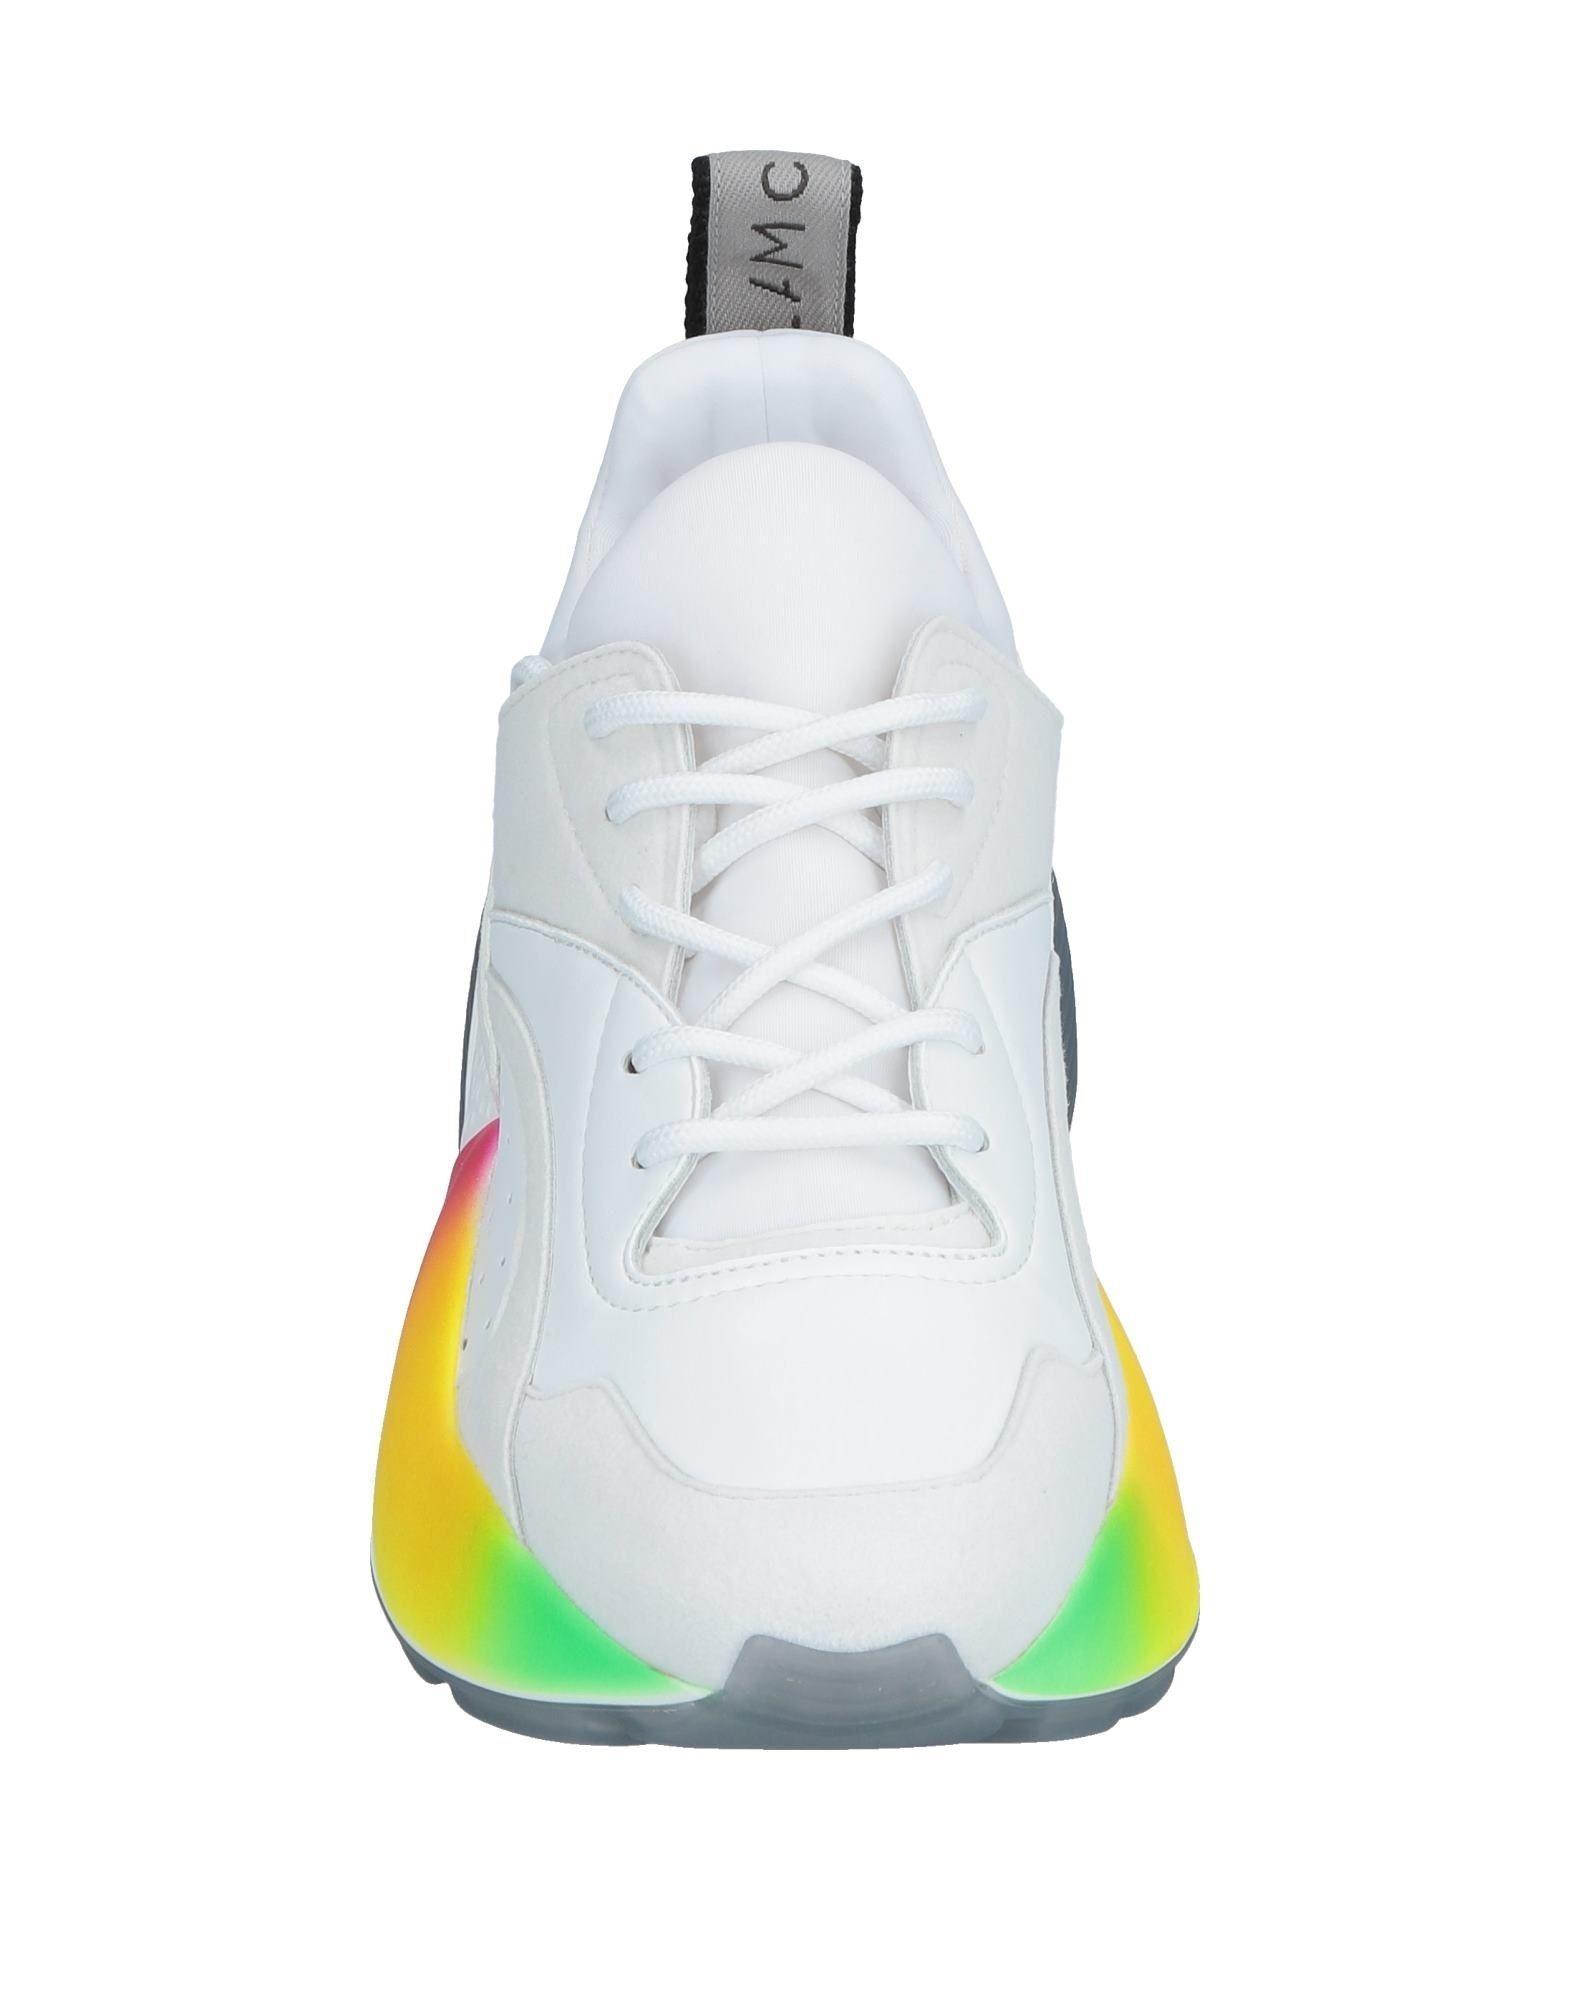 Sneakers & Tennis basses Stella McCartney en coloris Blanc zgaP